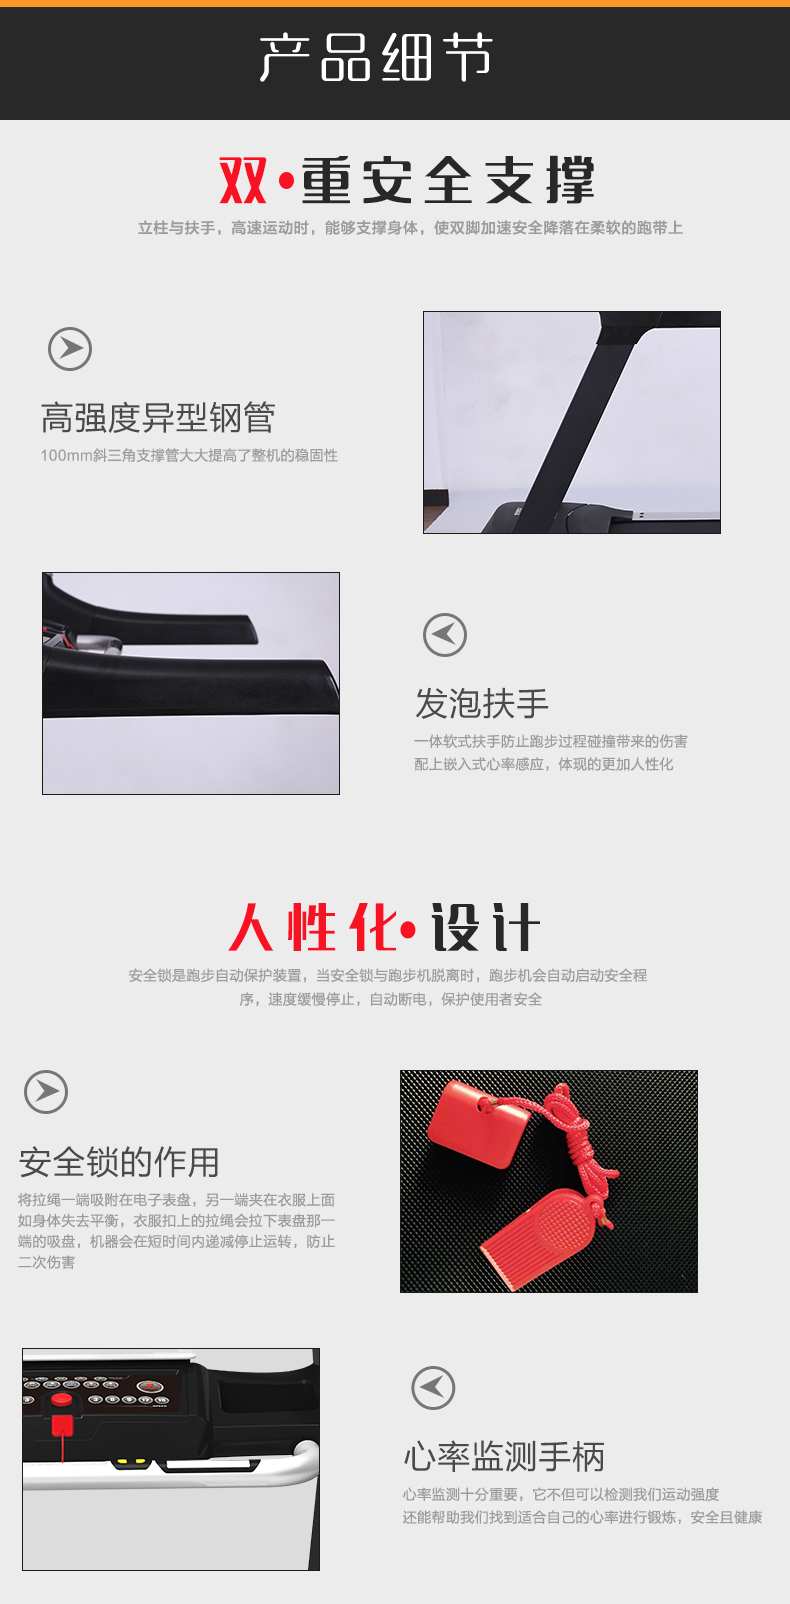 ZX-A520T多功能跑步机产品细节